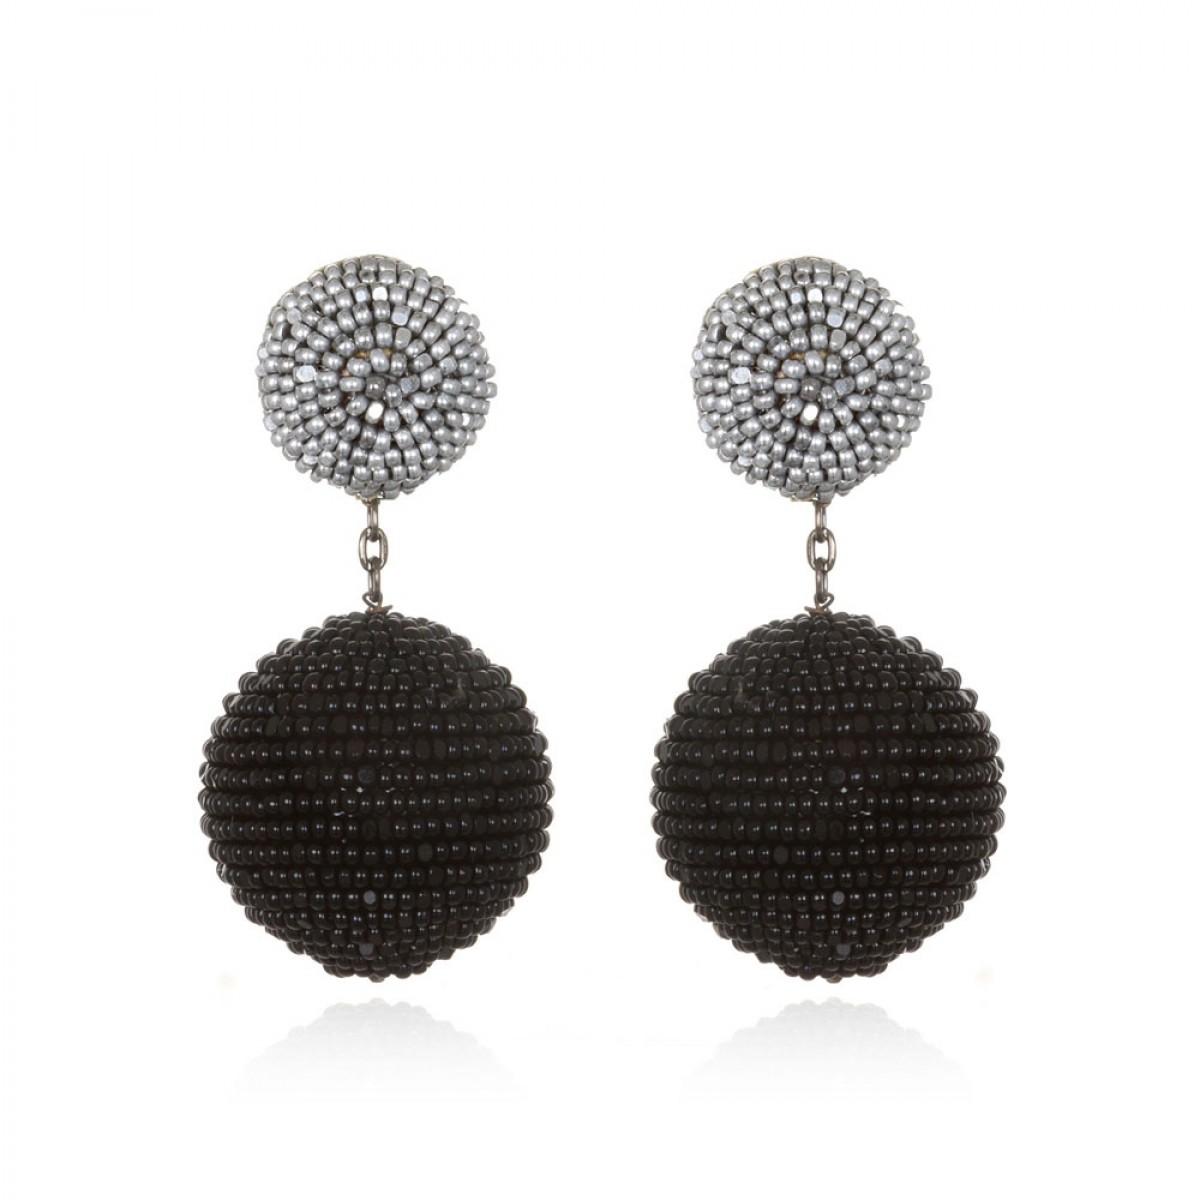 Mini Beaded Gumball Earrings  by SUZANNA DAI